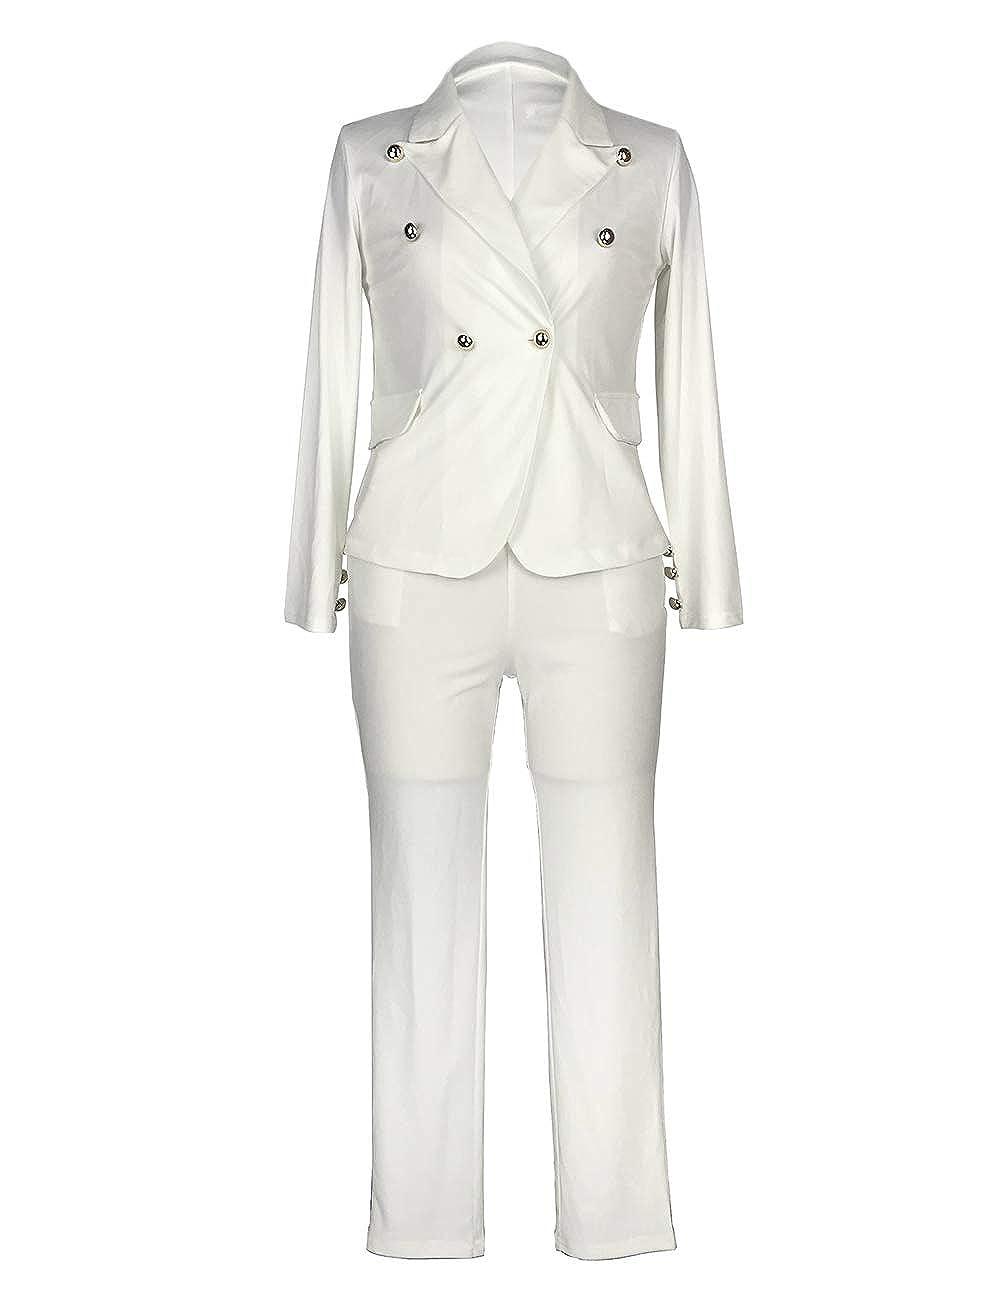 547e8eb0197a Amazon.com: Sematomala Women's 2 Piece Outfits Long Sleeve Black White  Elegant Business Office Lady Blazer Long Pant Suit Sets: Clothing